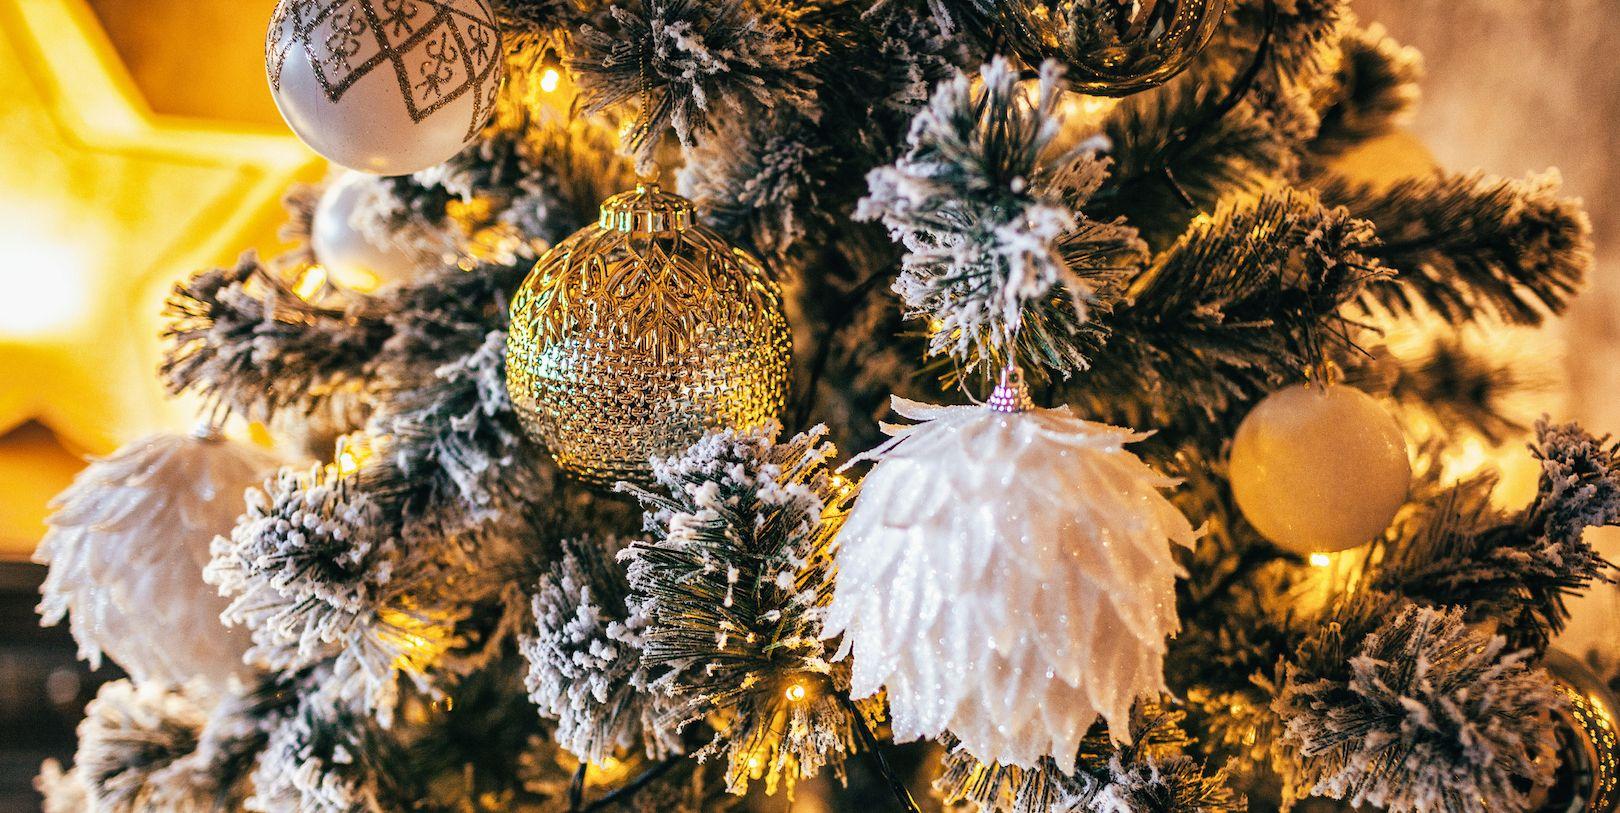 Beach Themed Christmas Tree Ornaments